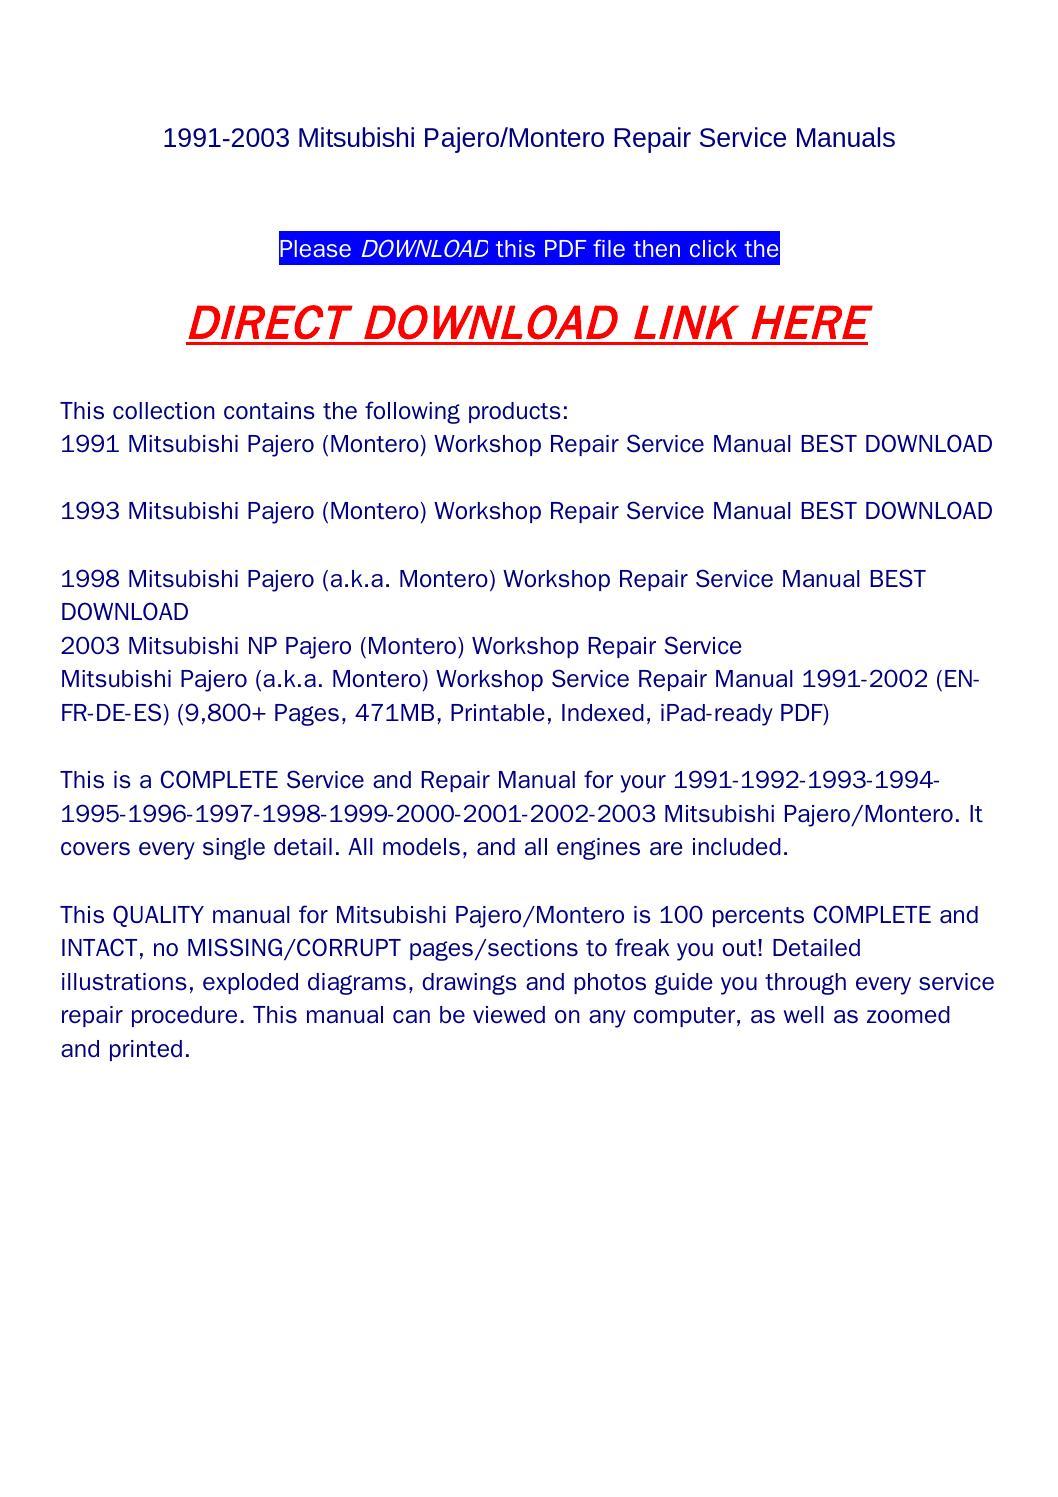 np pajero workshop manual download